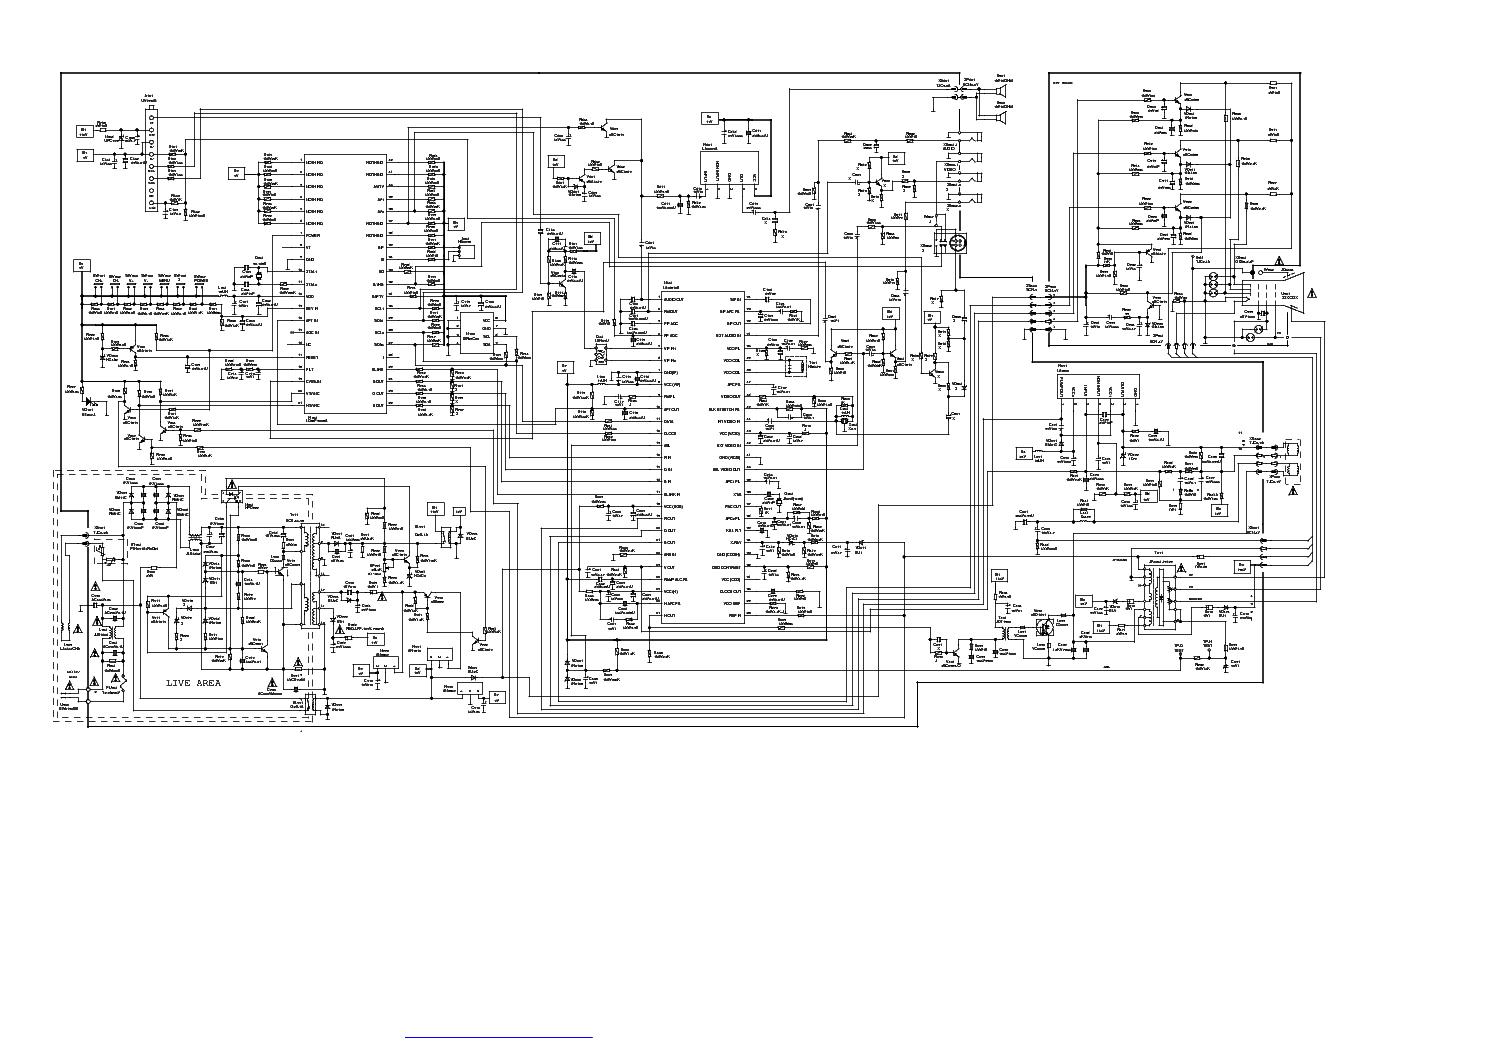 Haier 25t8kt 28 Strg965la7840 Service Manual Download Schematics Lcd Tv Schematic Diagram Http Elektrotanyacom Bekotelchassis127 Htx14s33